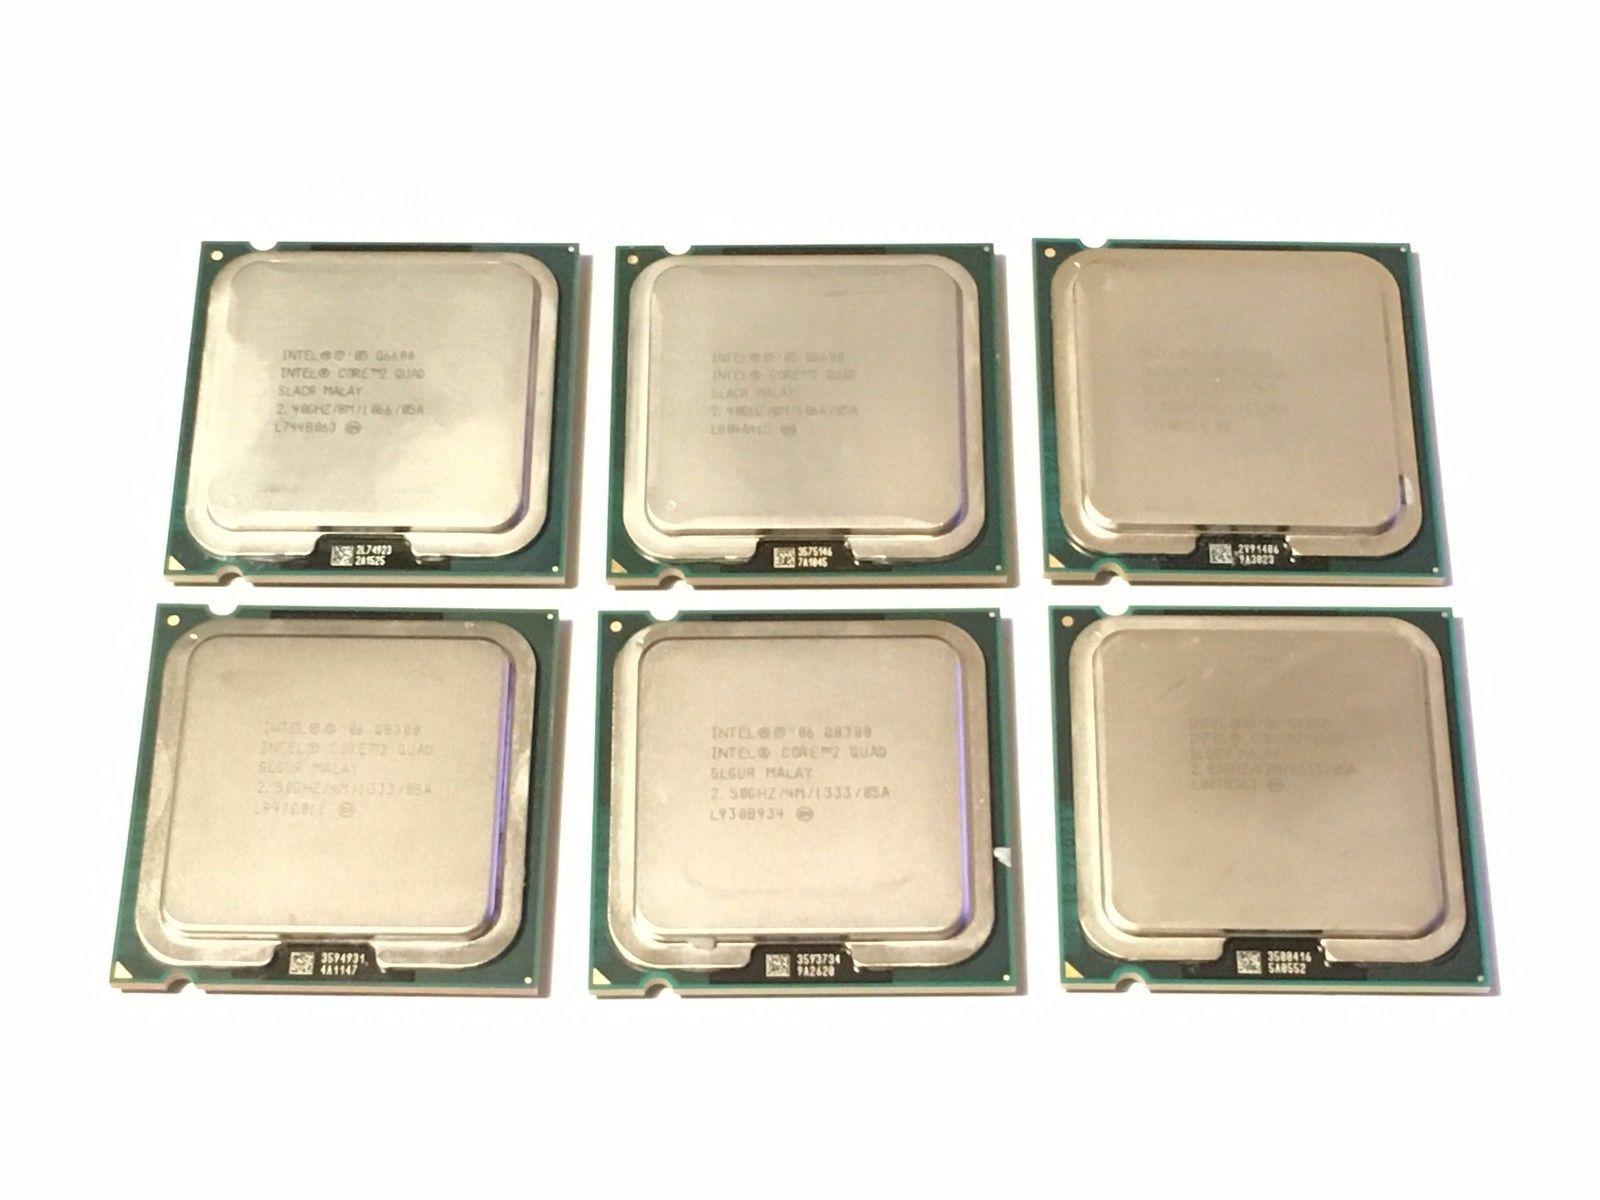 Lot Of 6 Intel Core 2 Quad Cpu Processors Q9550 Q8300 Q8200 Q6600 Processor Tested Working